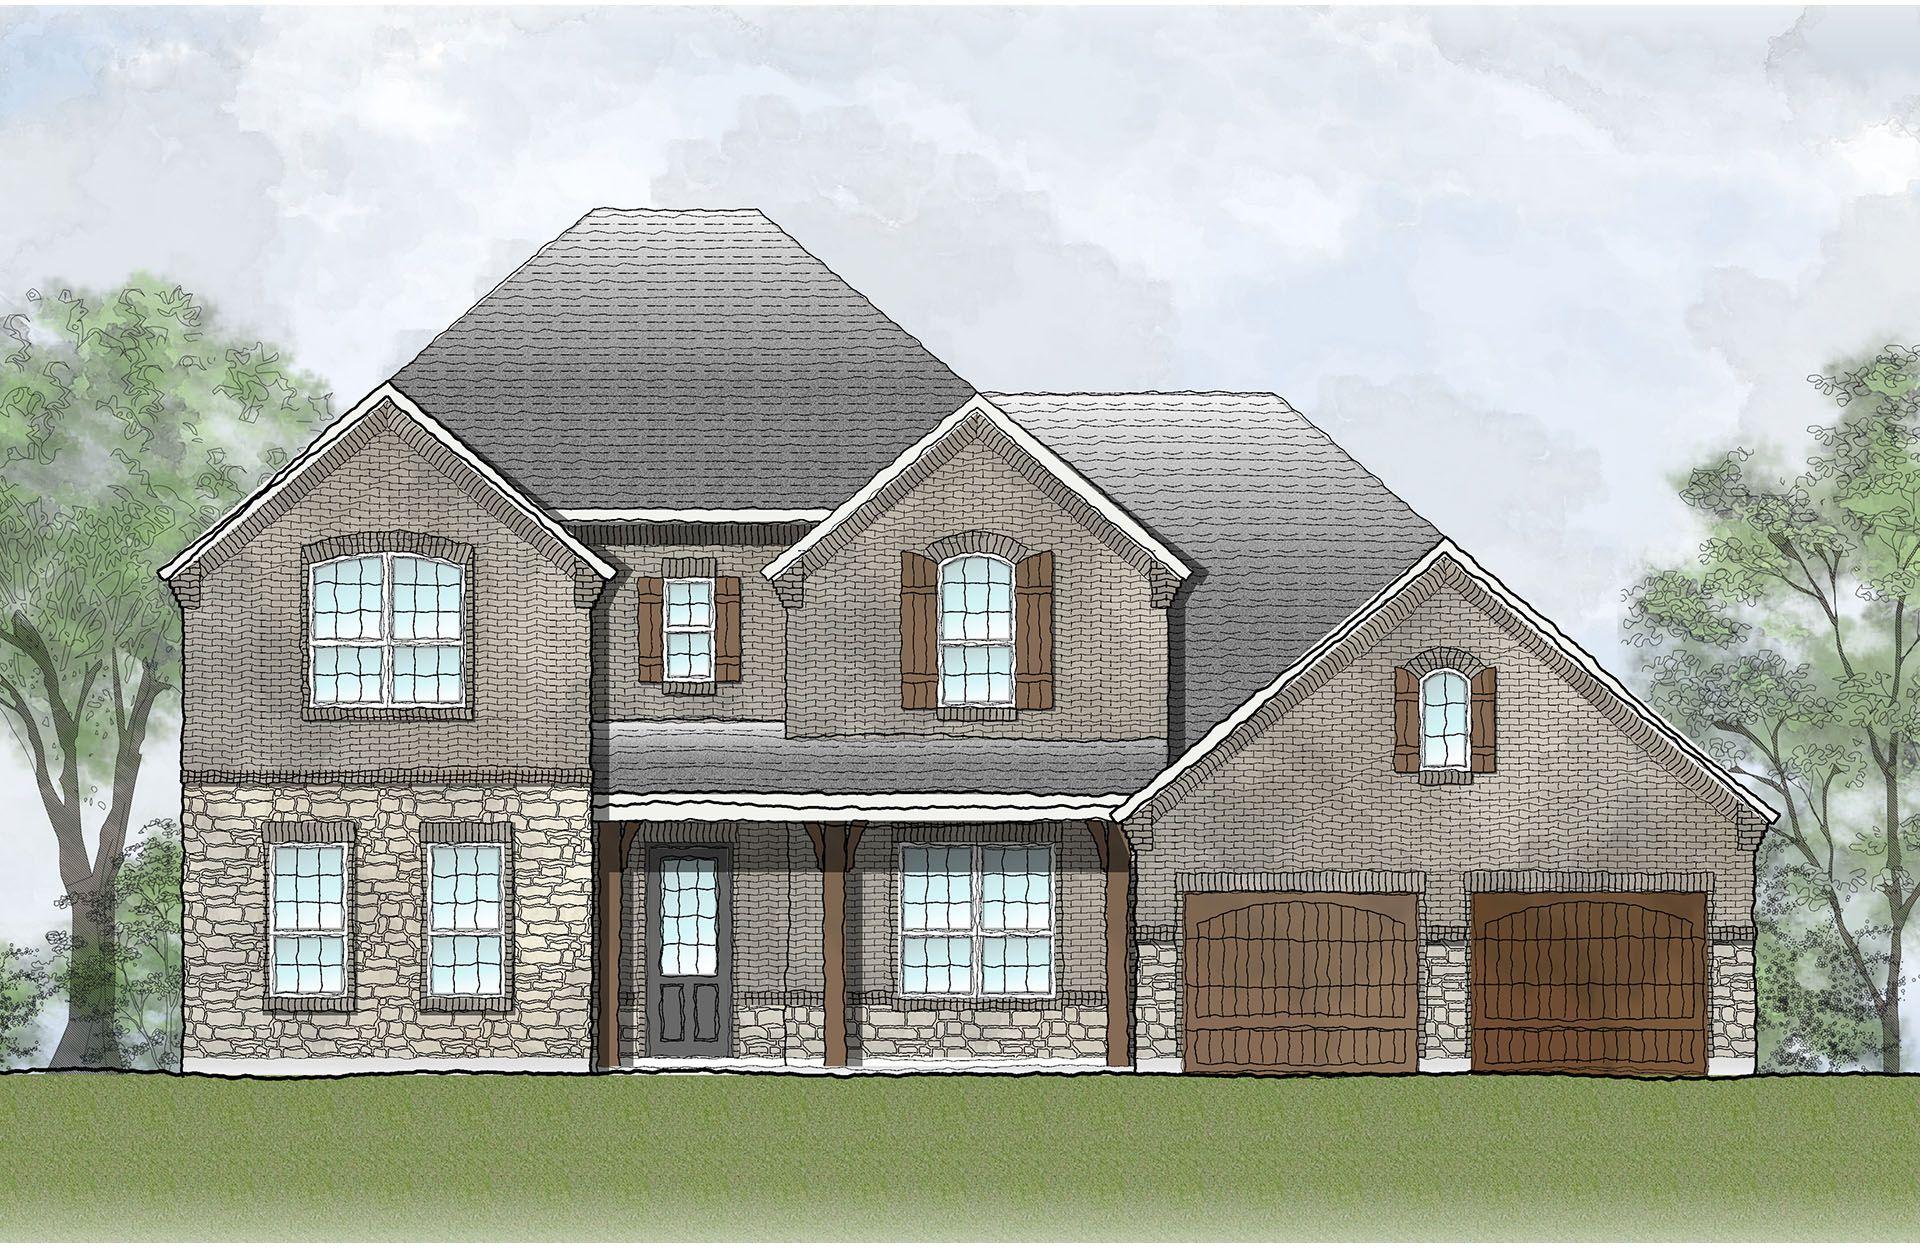 2858 Volterra Way, Keller, TX Homes & Land - Real Estate